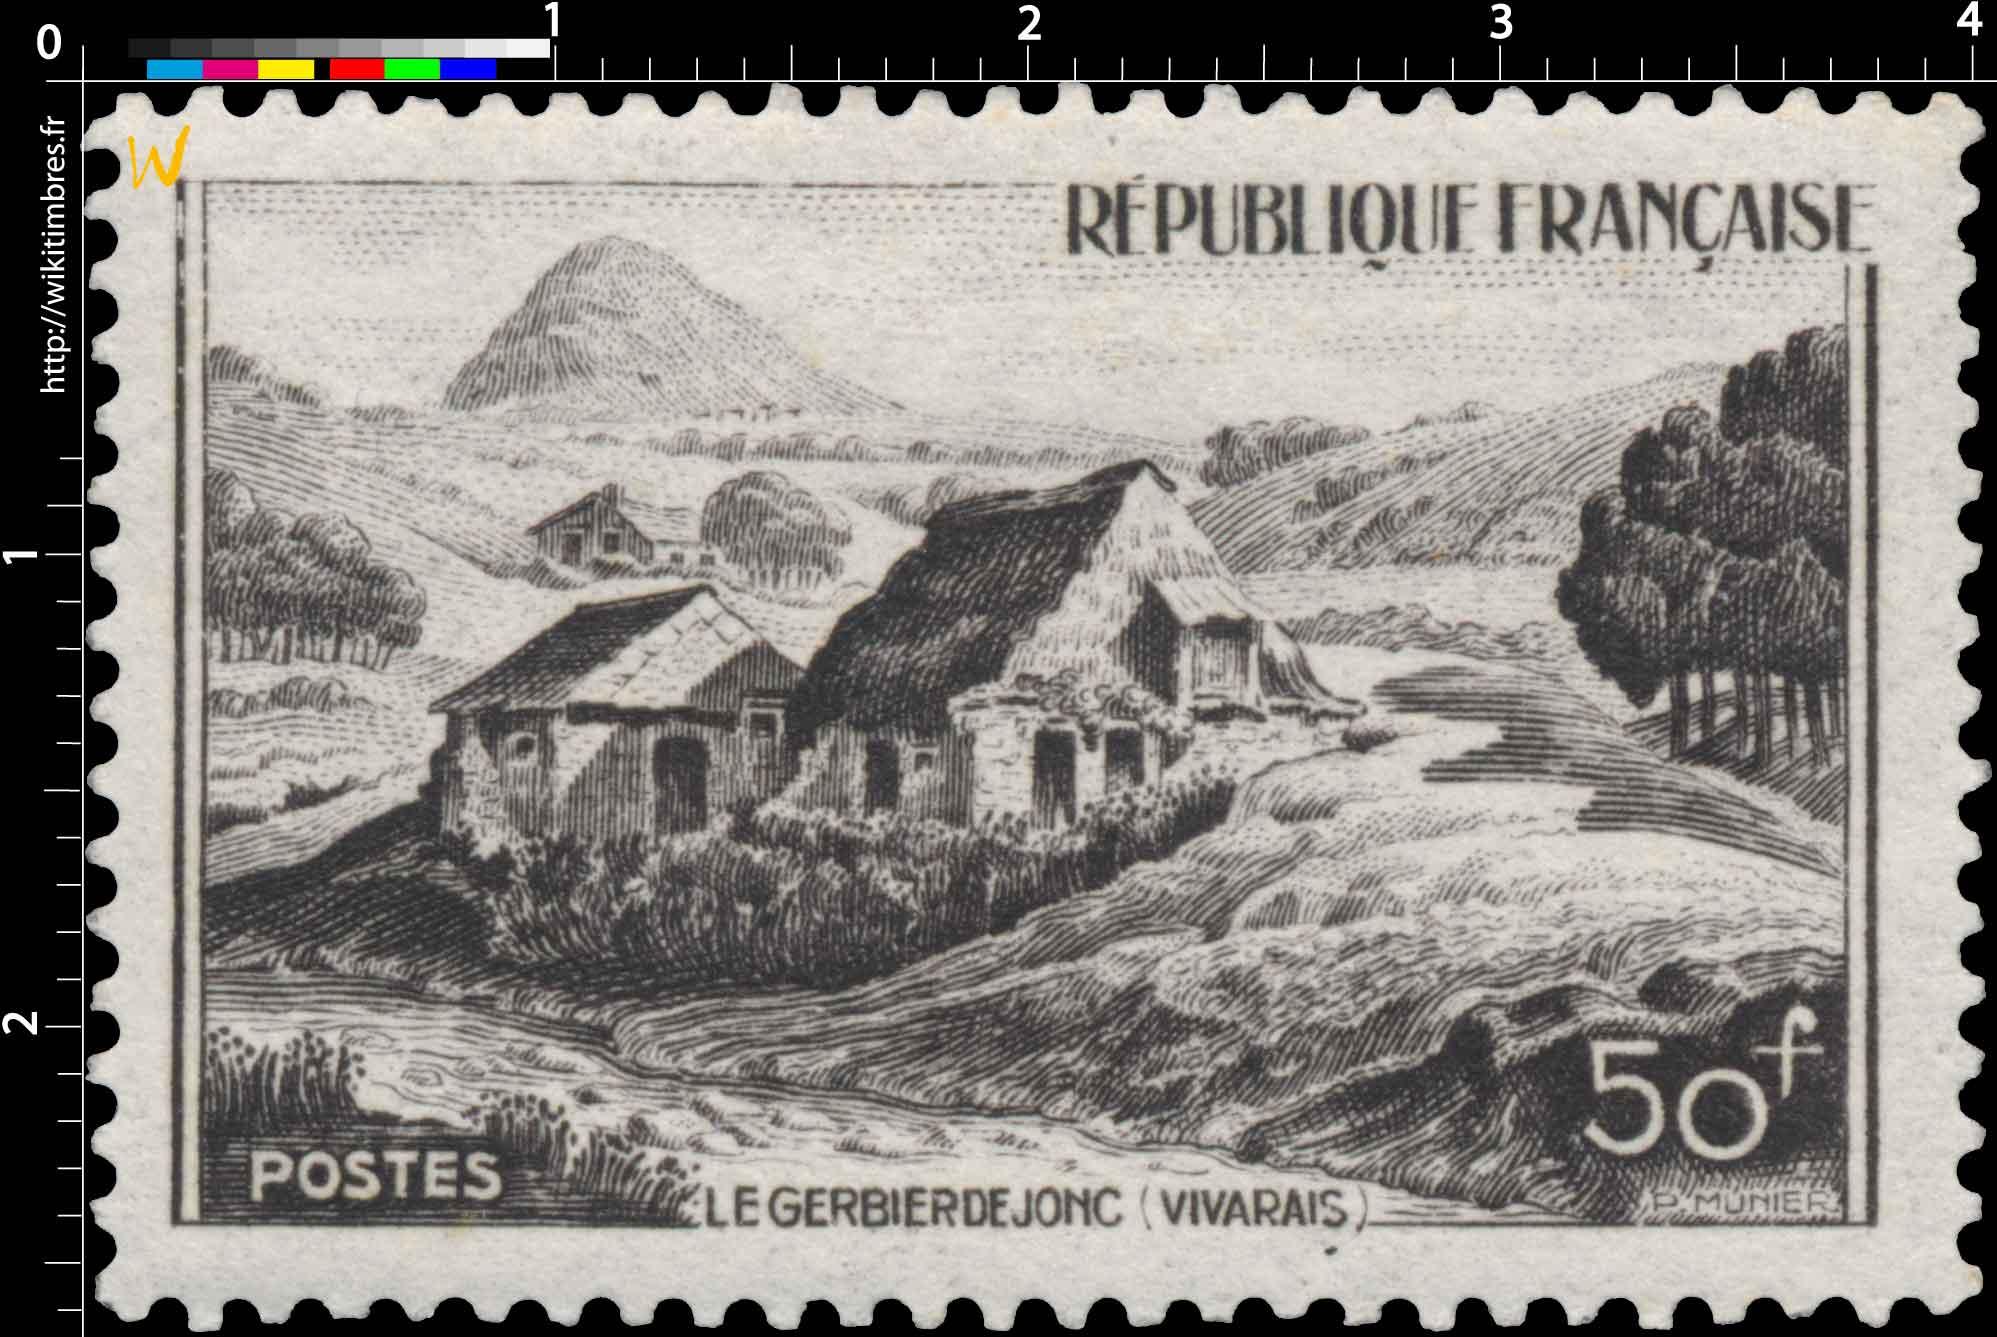 LE GERBIER DE JONC (VIVARAIS)